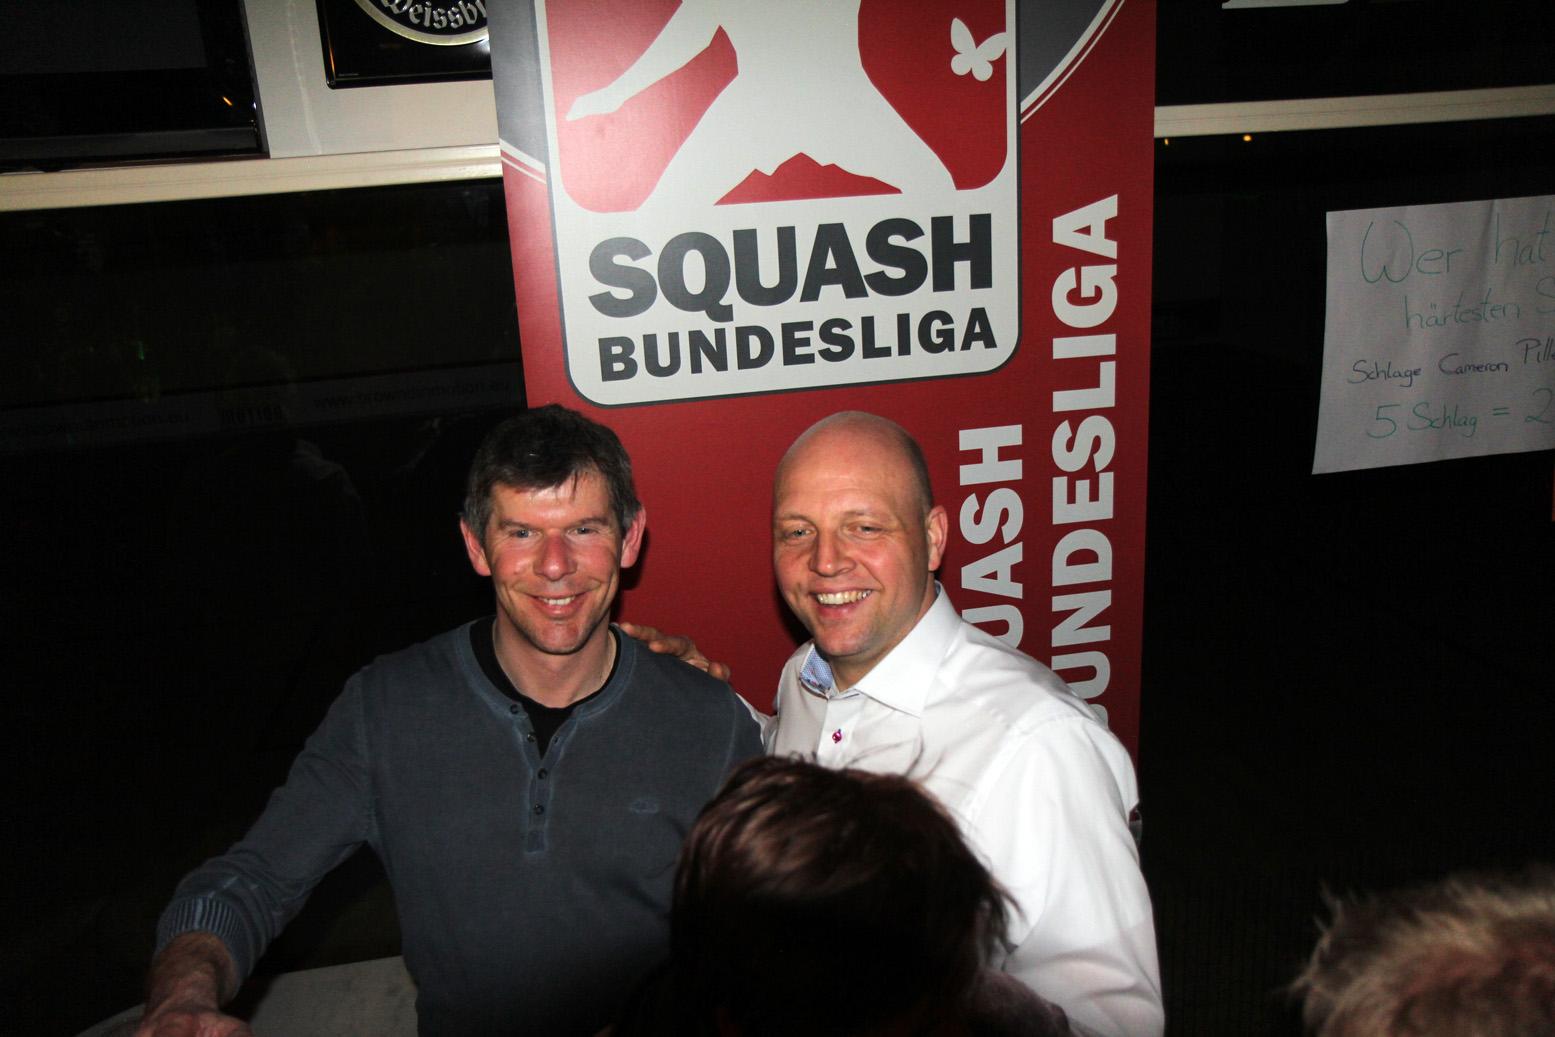 2015-04-18 Squash BL Playoffs Frankfurt 442.jpg